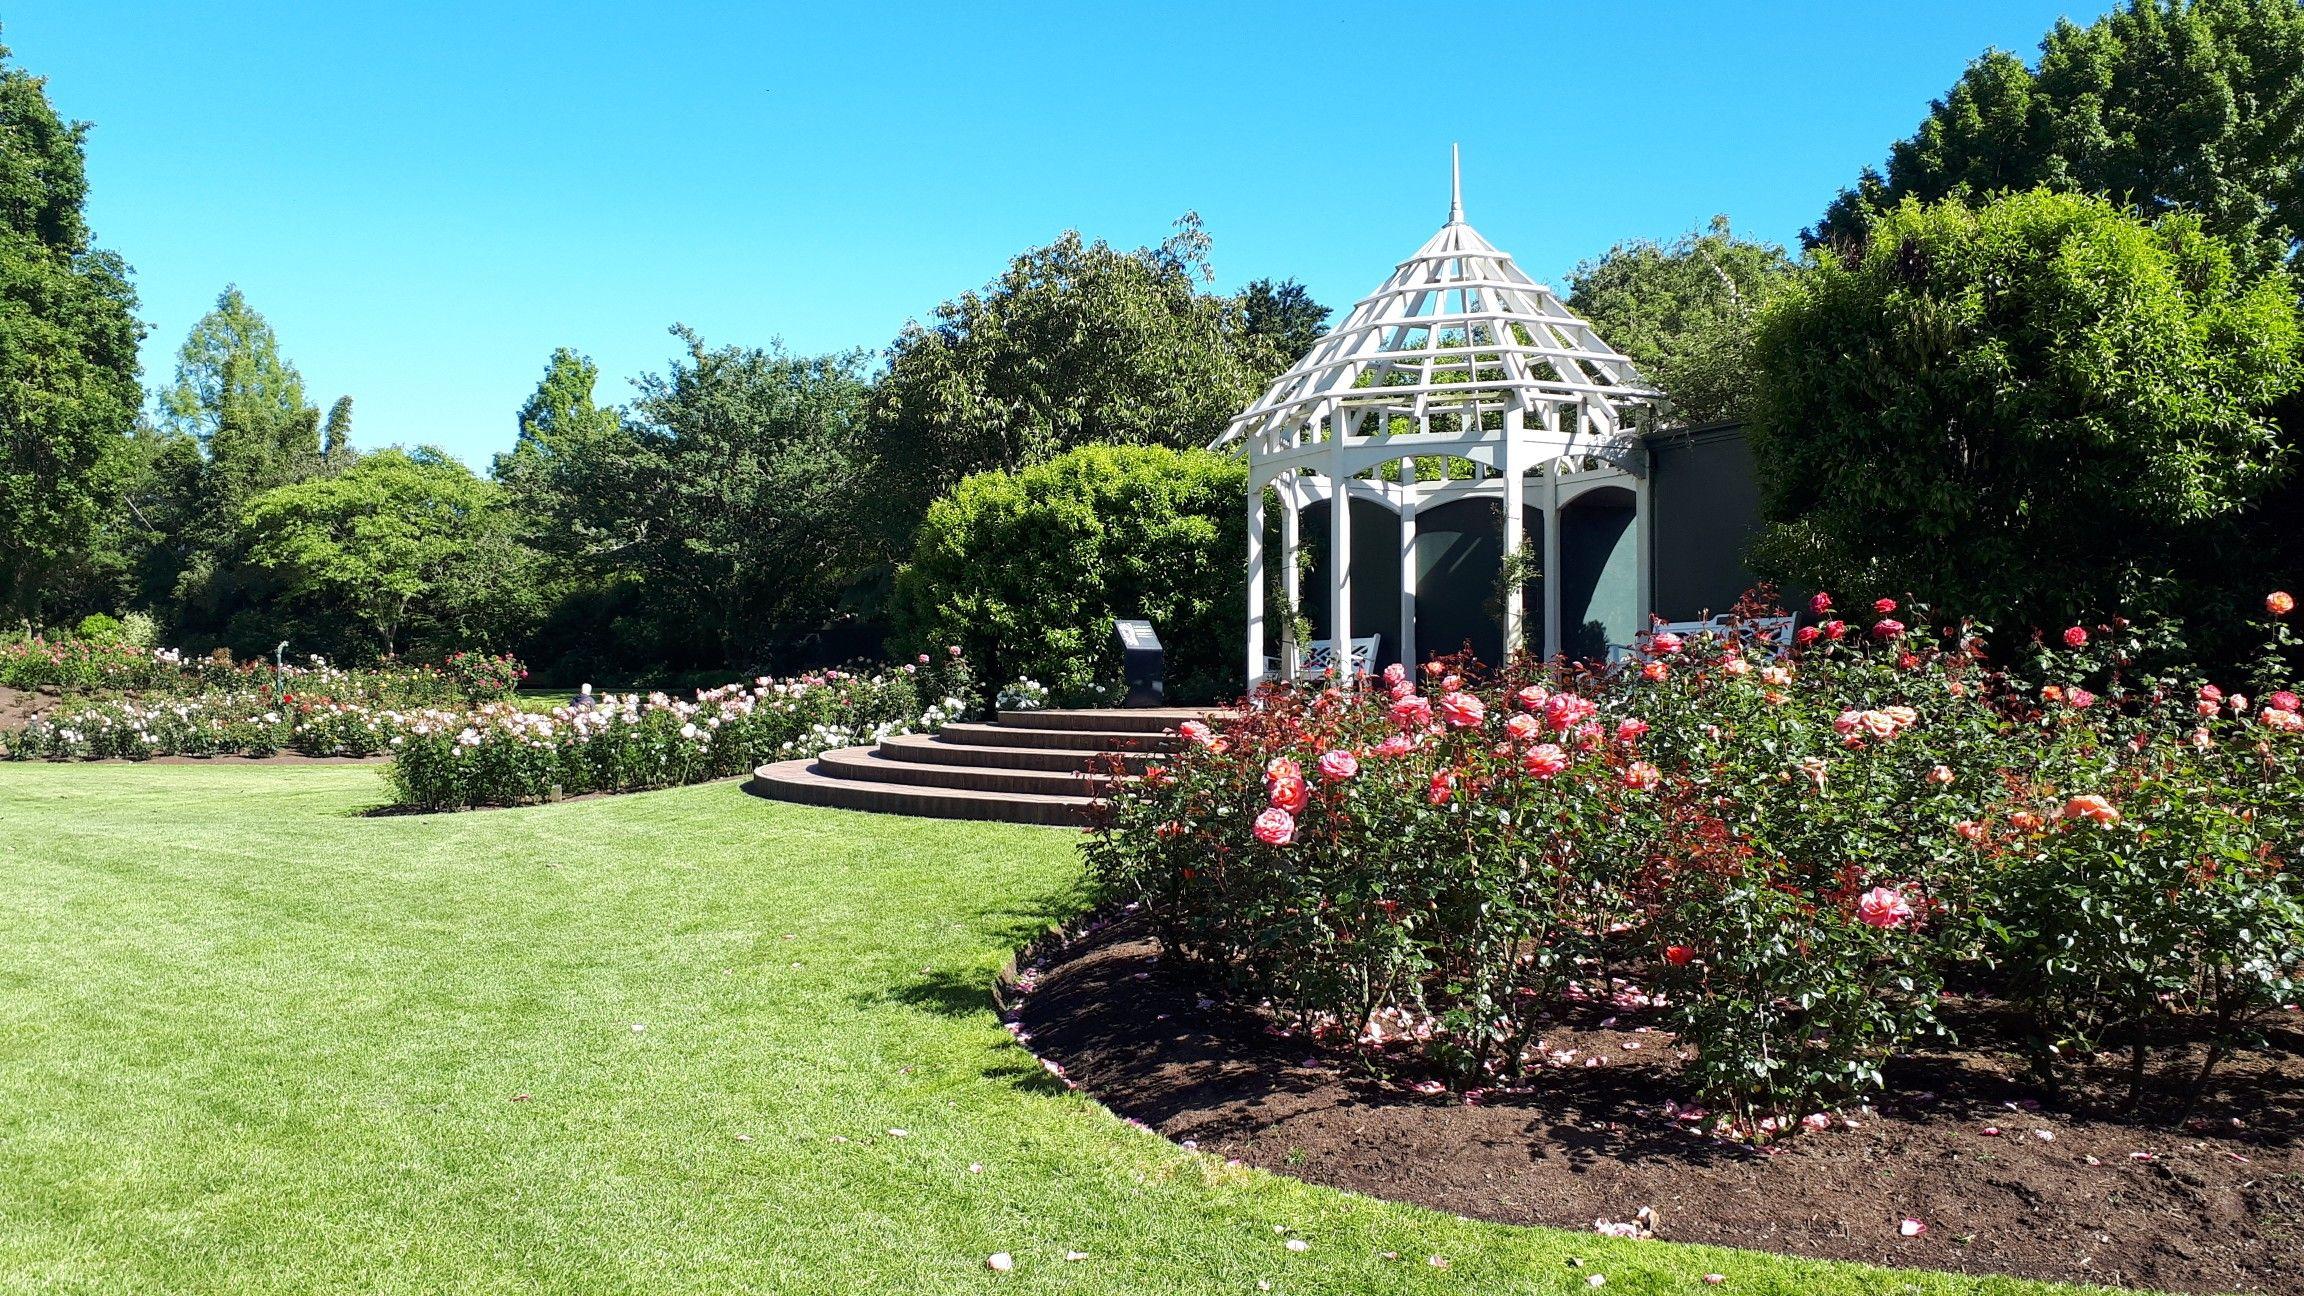 Rose Garden Hamilton Gardens New Zealand New Zealand Waikato Rose Garden